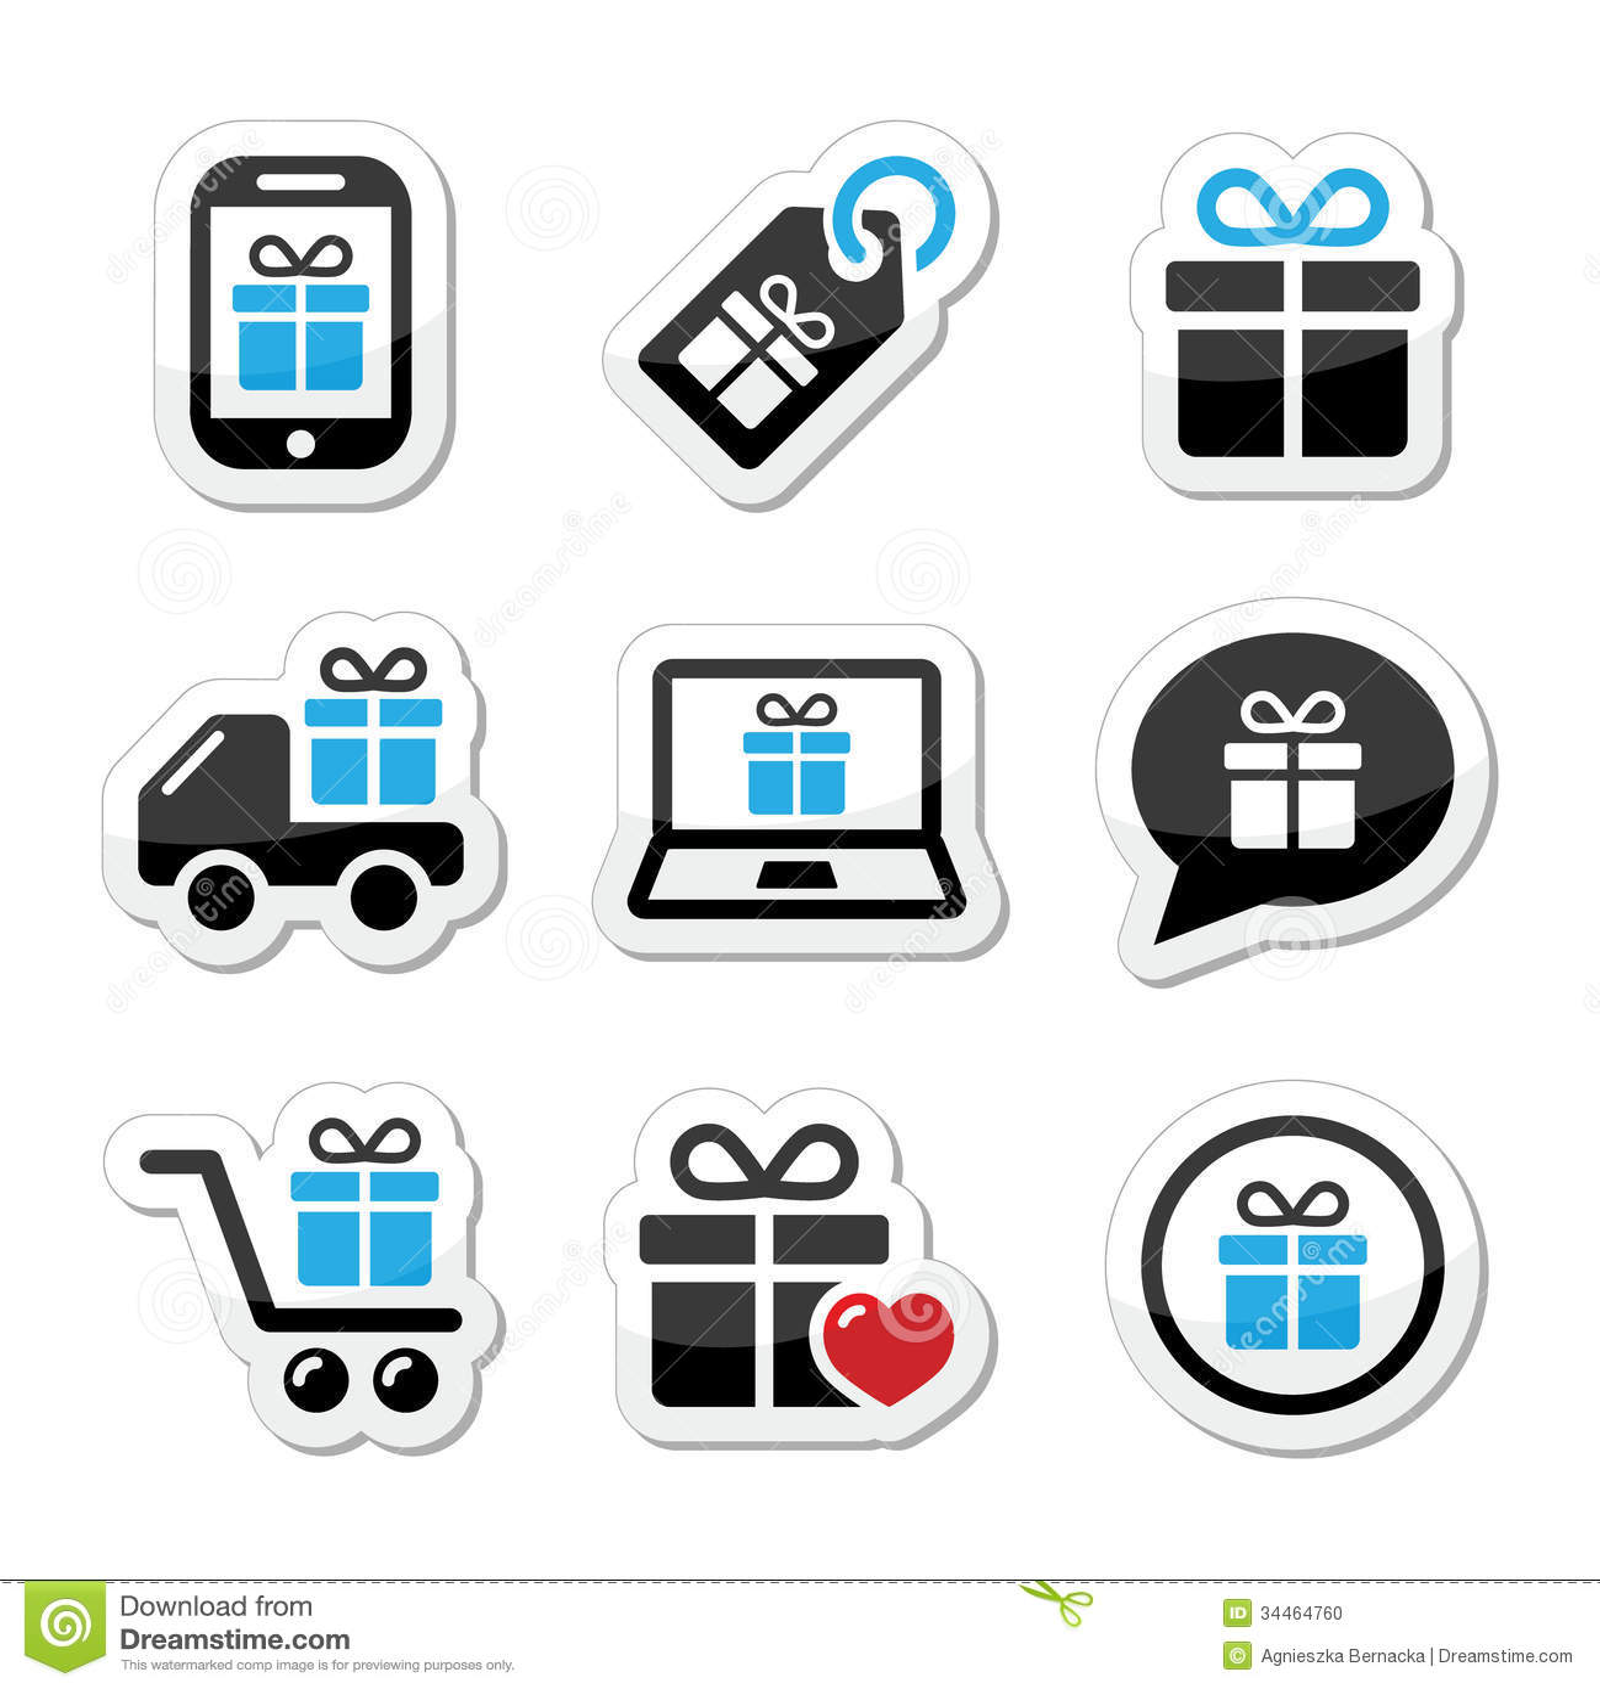 present shopping icons set stock illustration illustration of bubble shipping 34464760. Black Bedroom Furniture Sets. Home Design Ideas